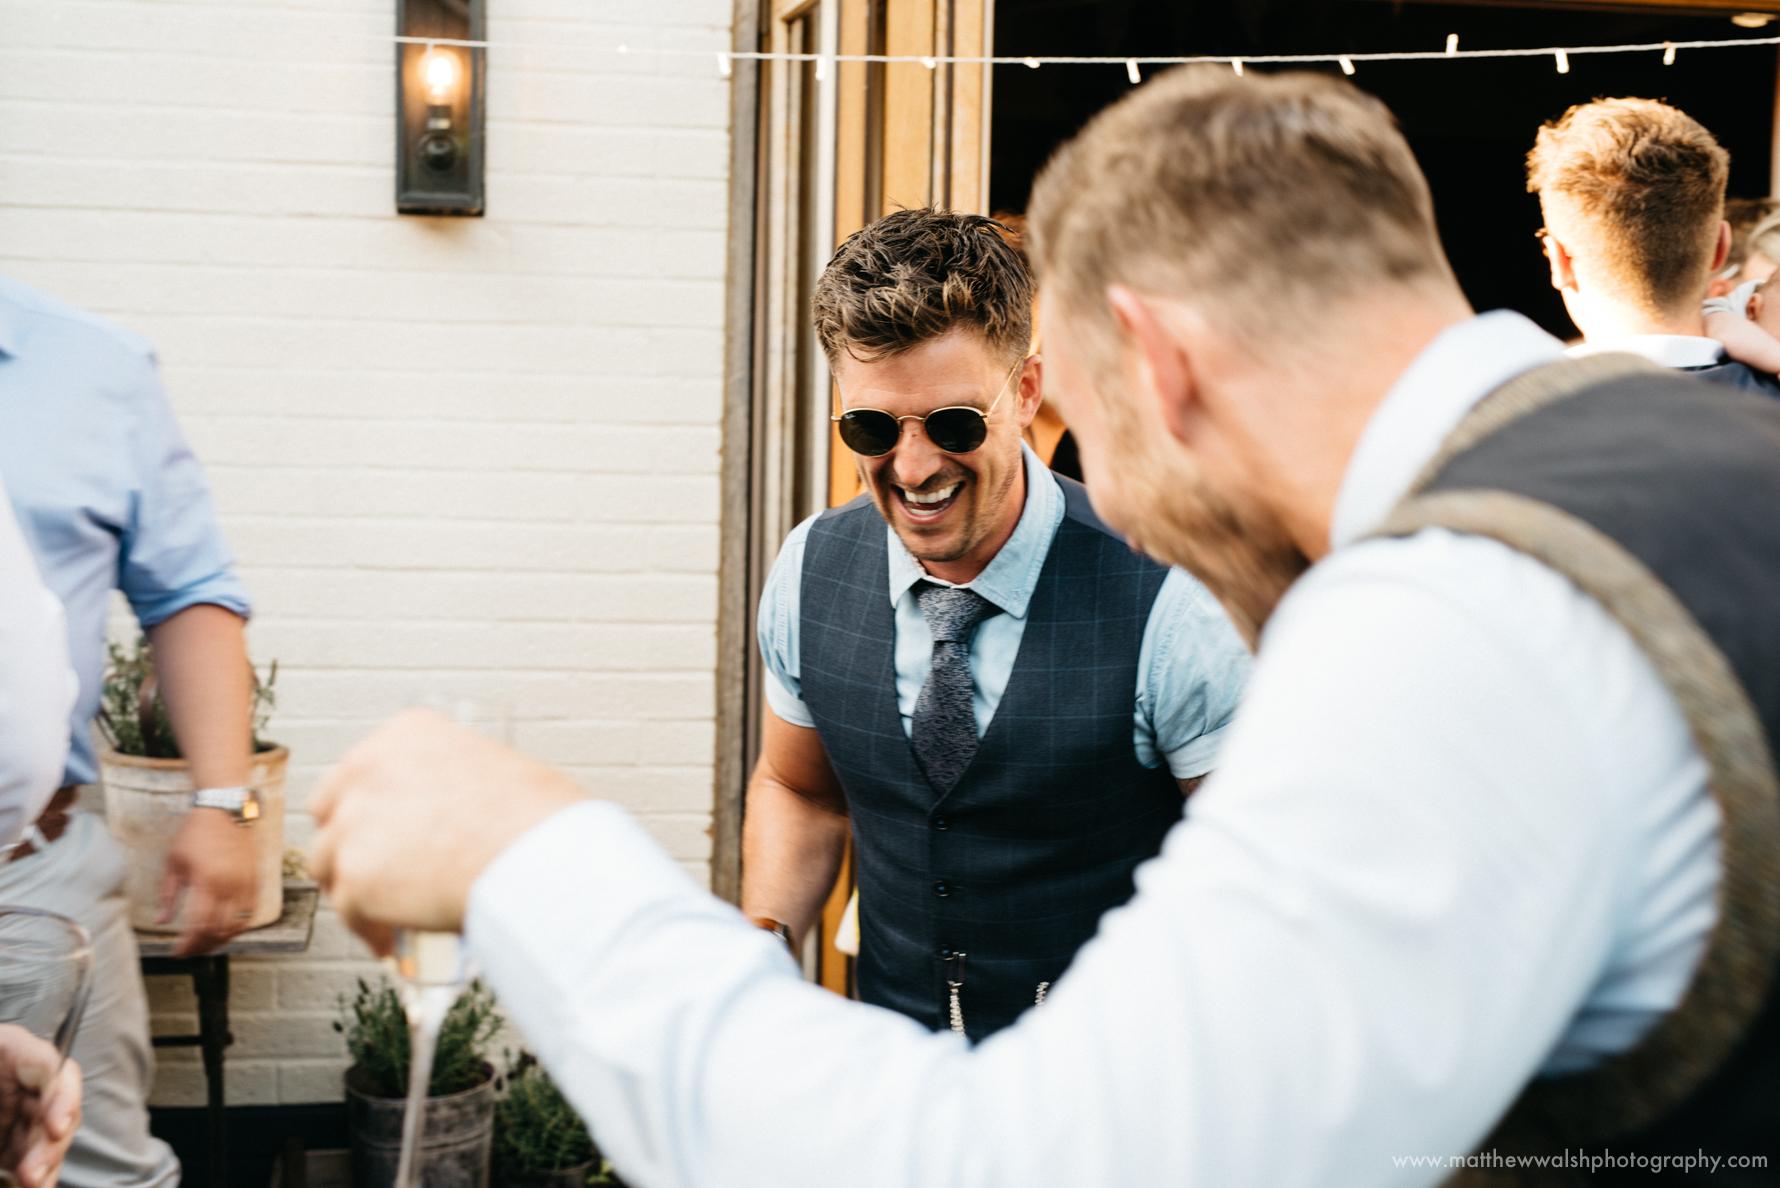 Friends having a laugh dancing